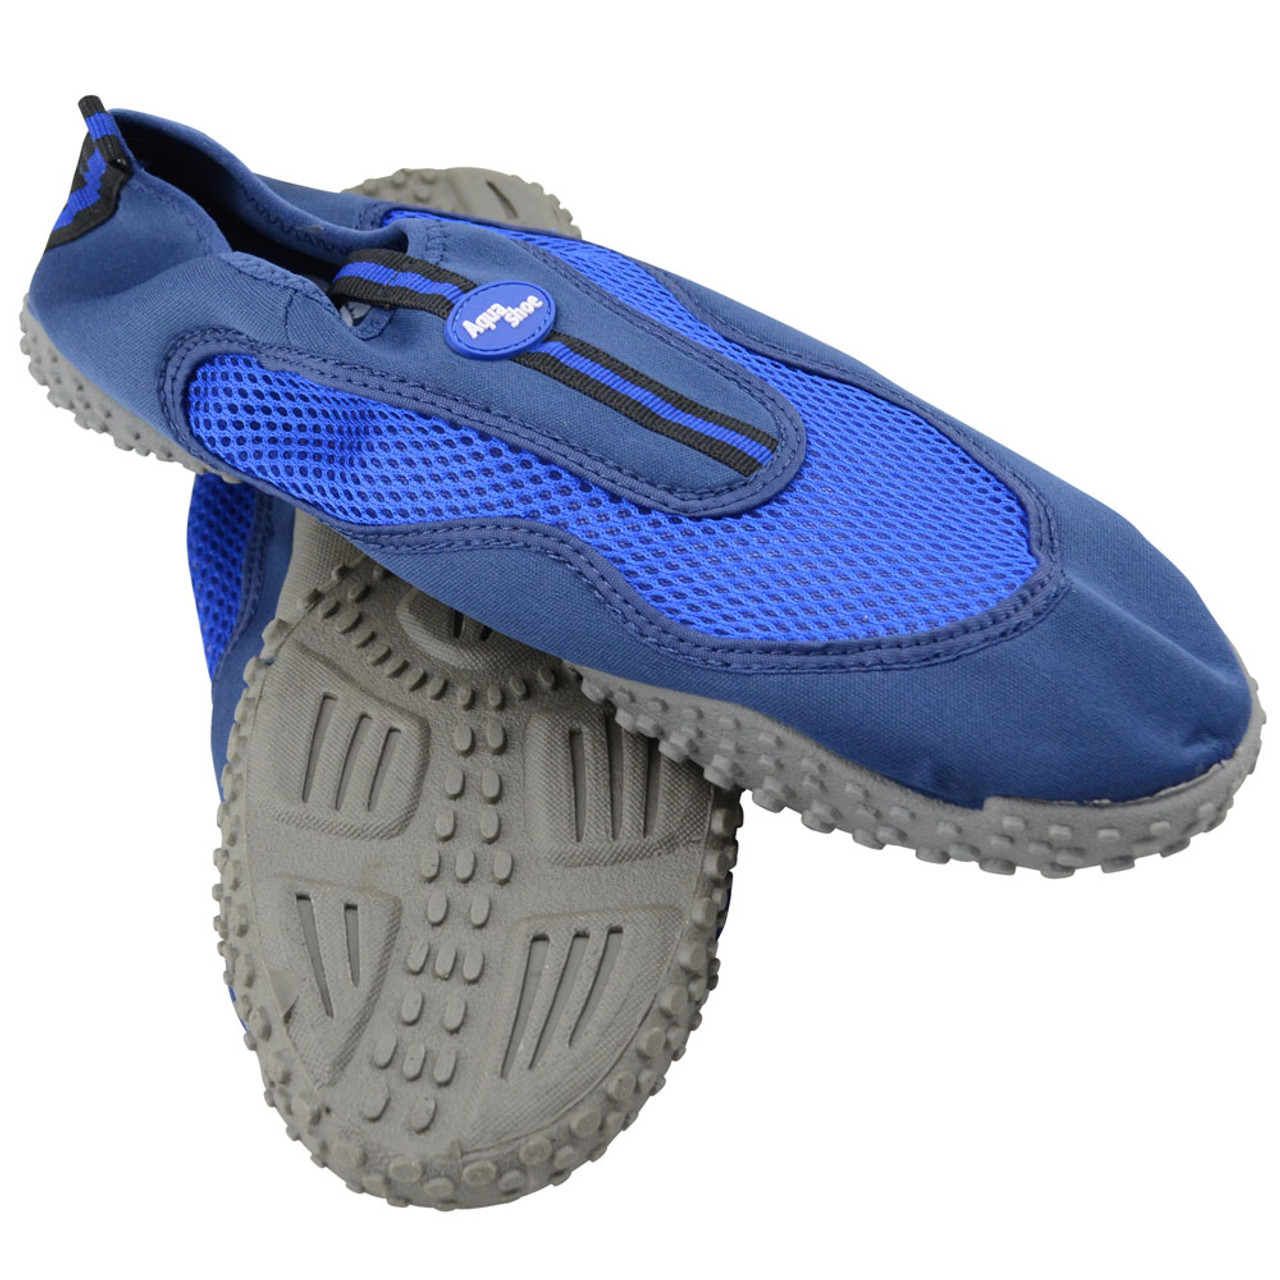 Land And Sea Aqua Shoes for beach, pool